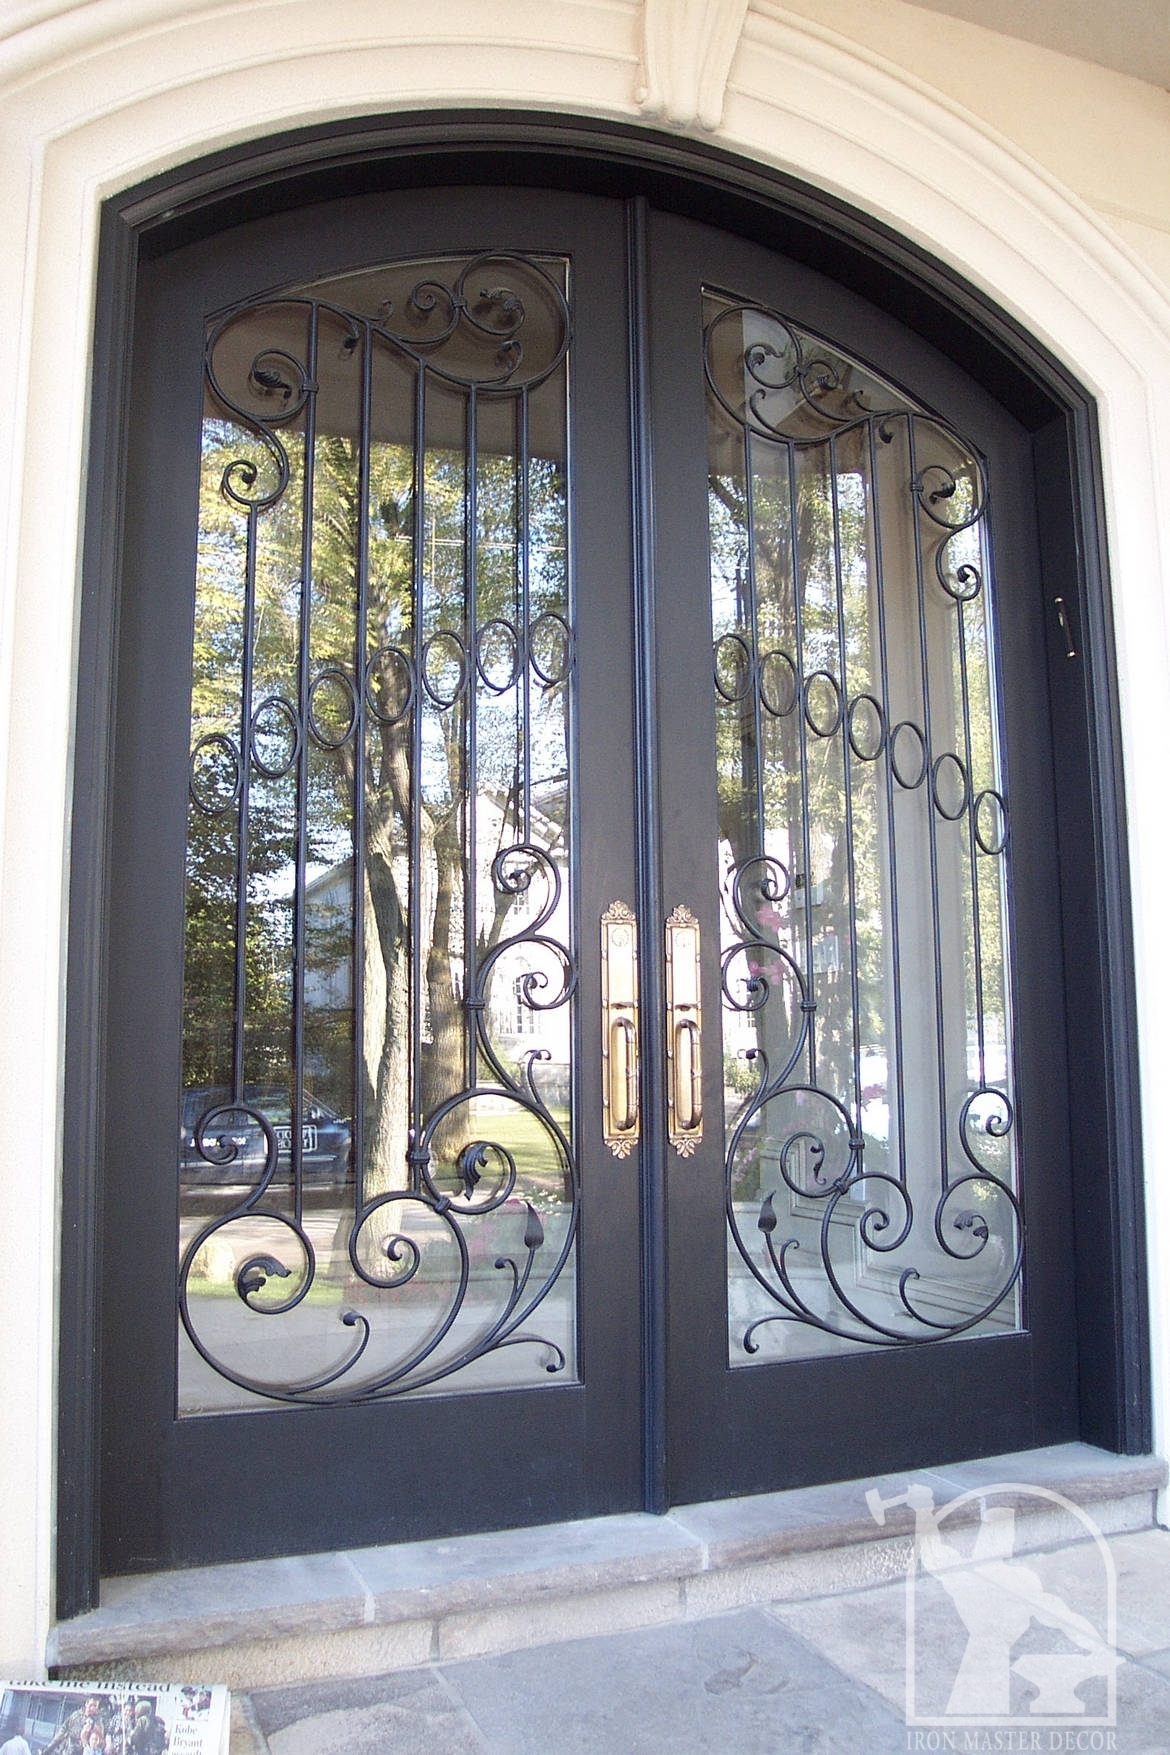 Wrought Iron Front Door Photo Gallery | Iron Master